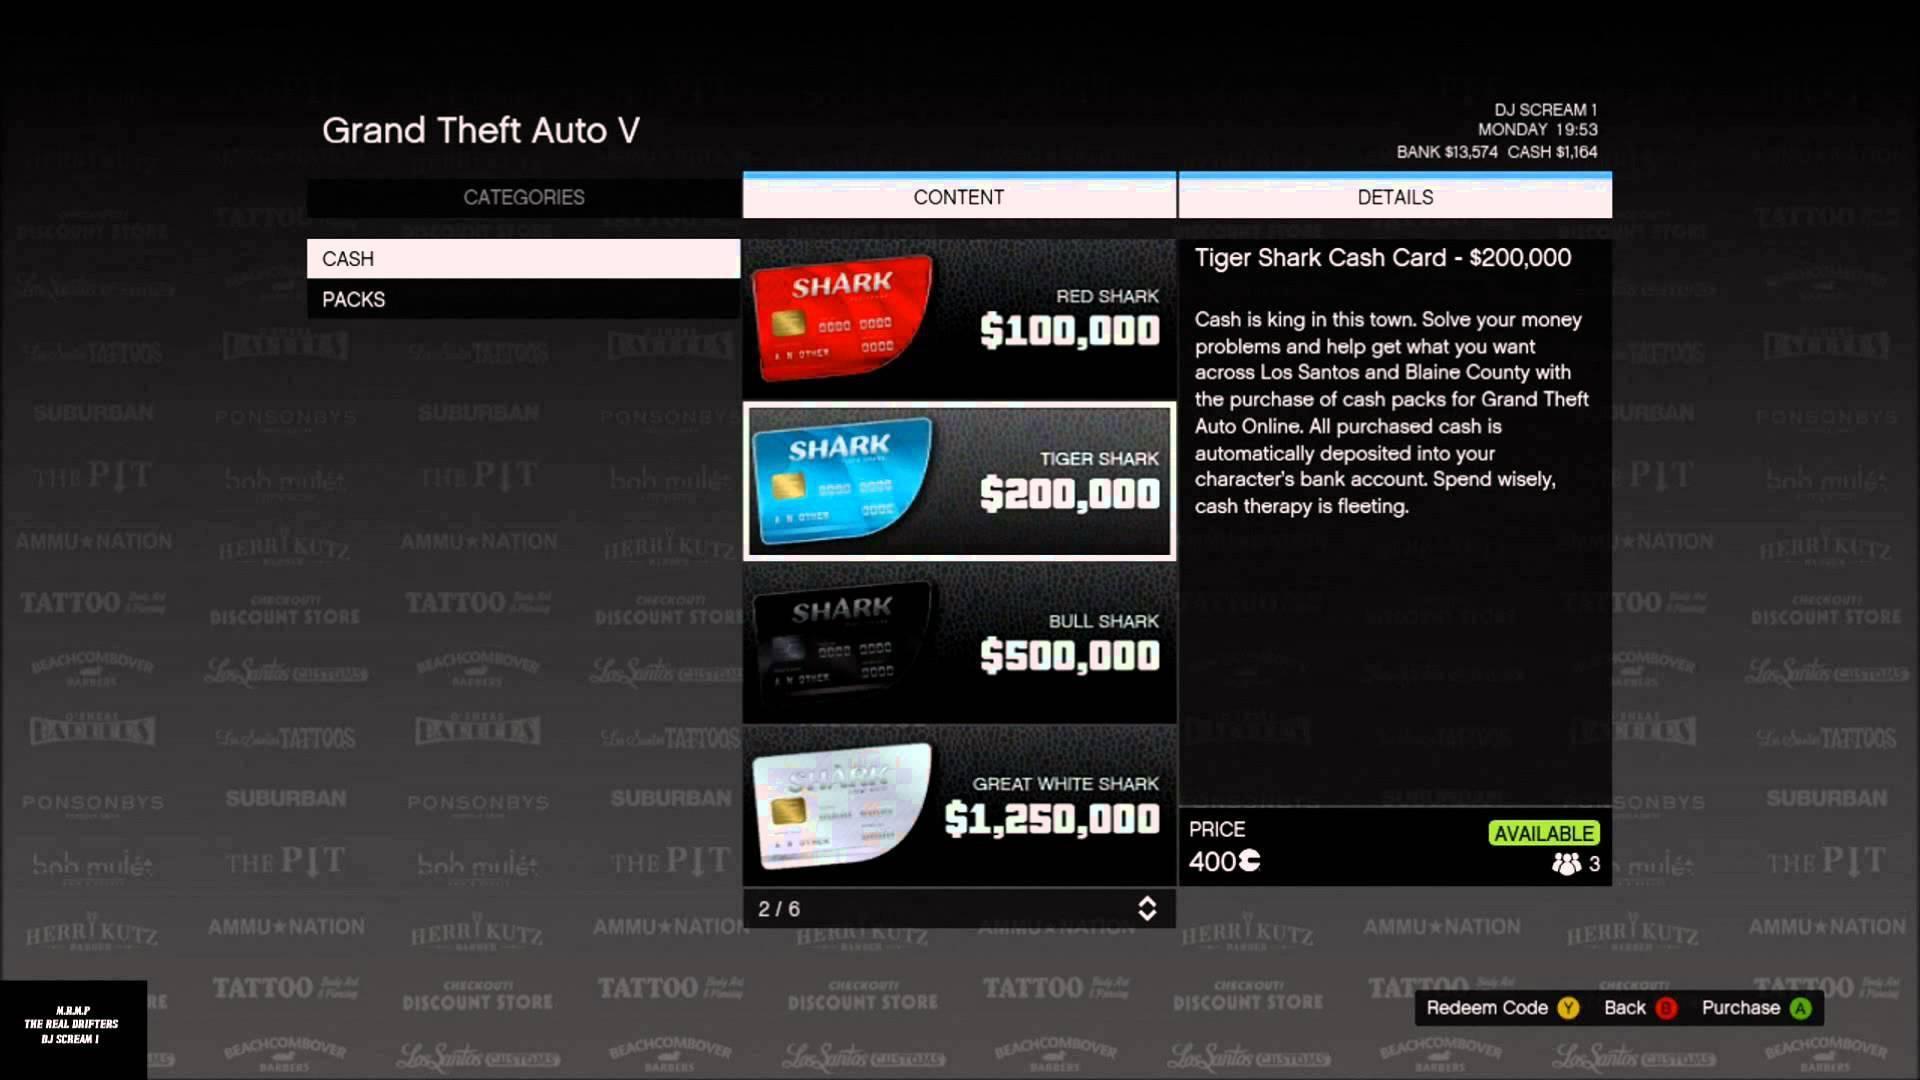 gta online - great white shark cash card (xbox one)